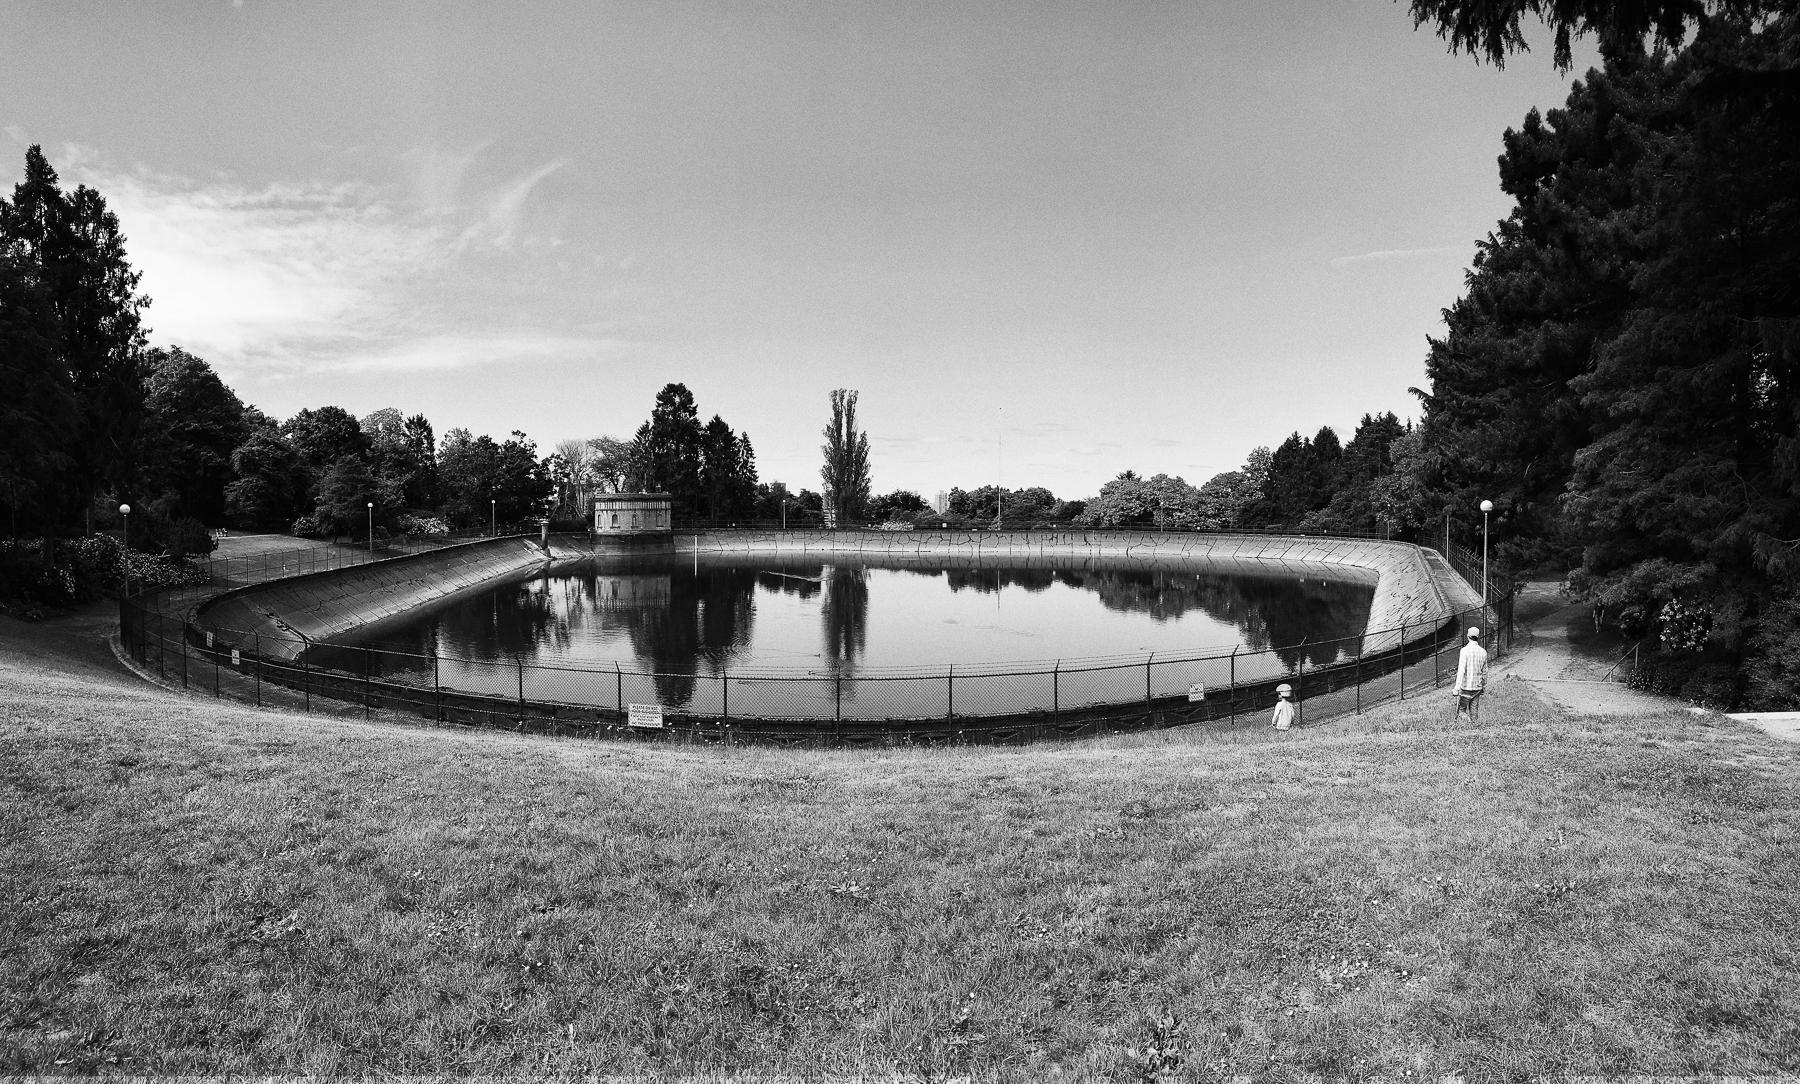 Friendship Park Reservoir